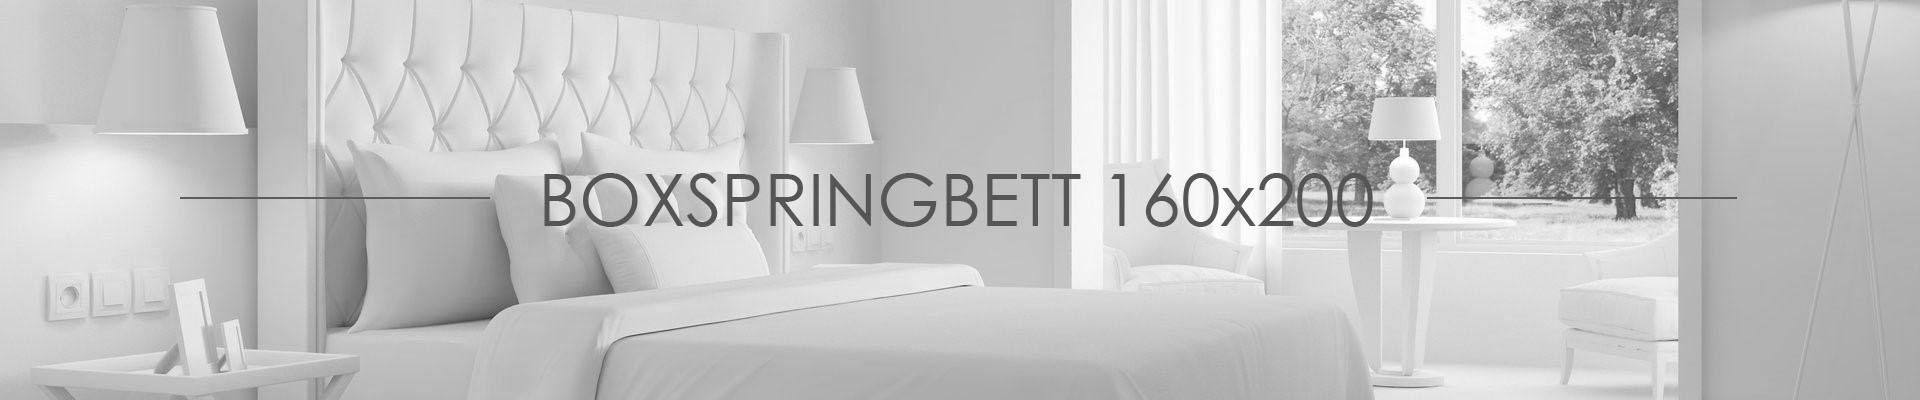 Boxspringbett 160x200